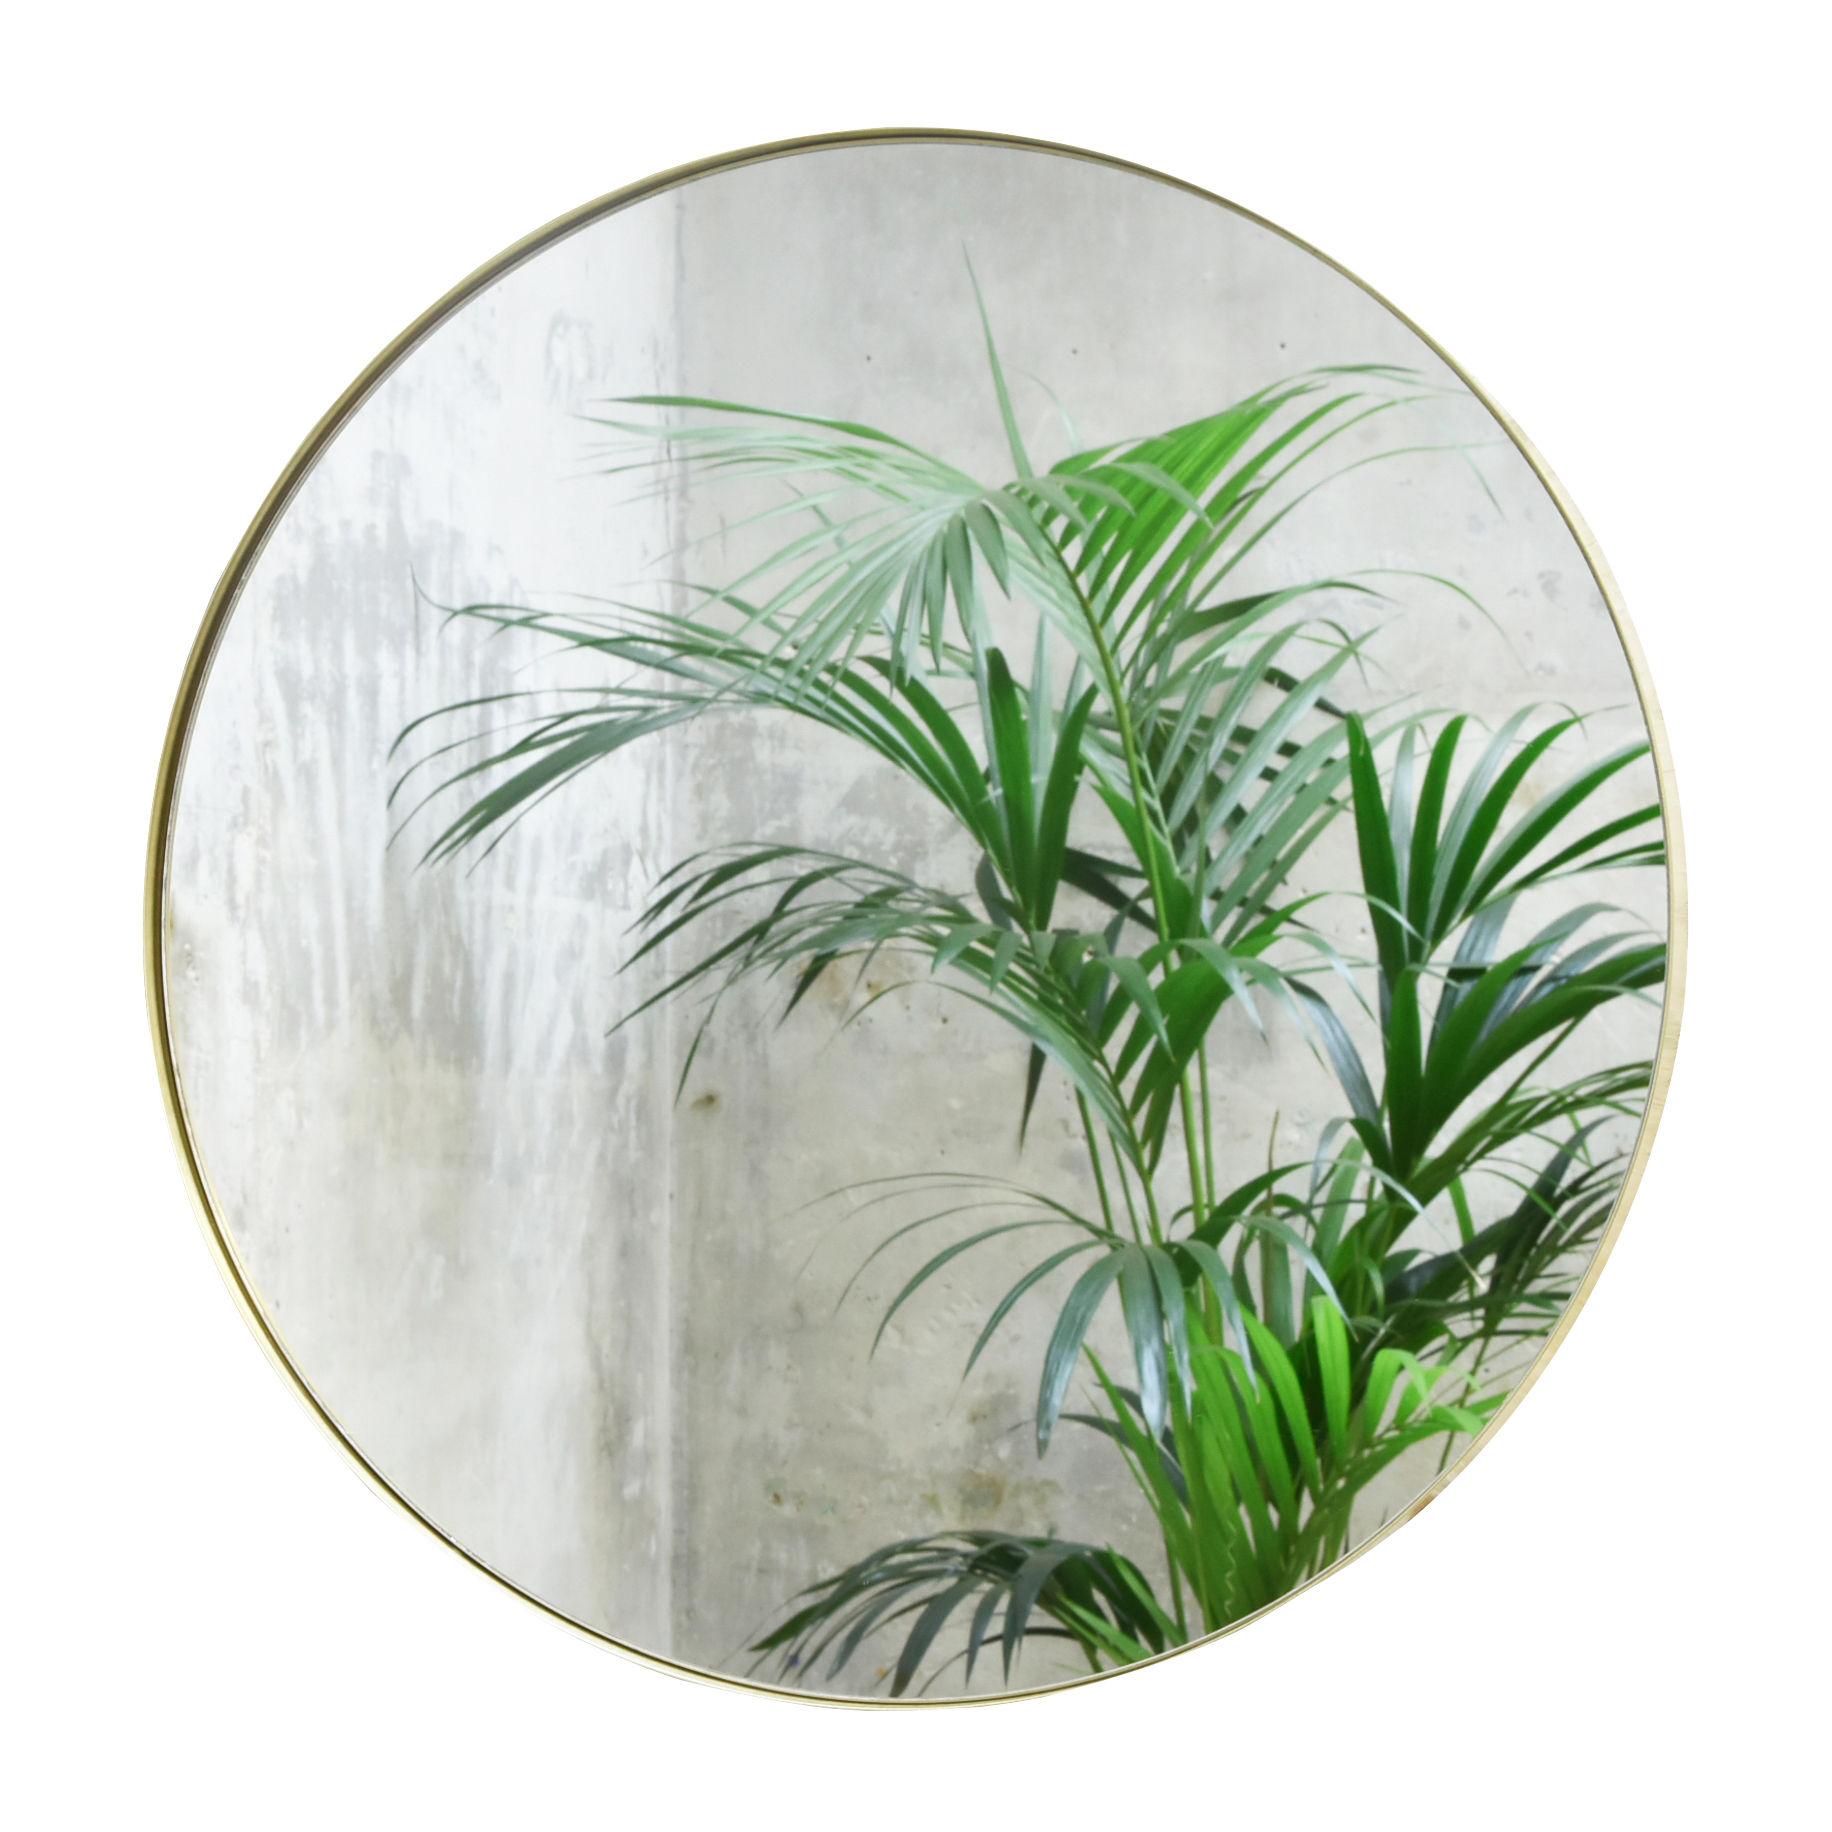 miroir mural cruziana rond 47 cm laiton enostudio. Black Bedroom Furniture Sets. Home Design Ideas